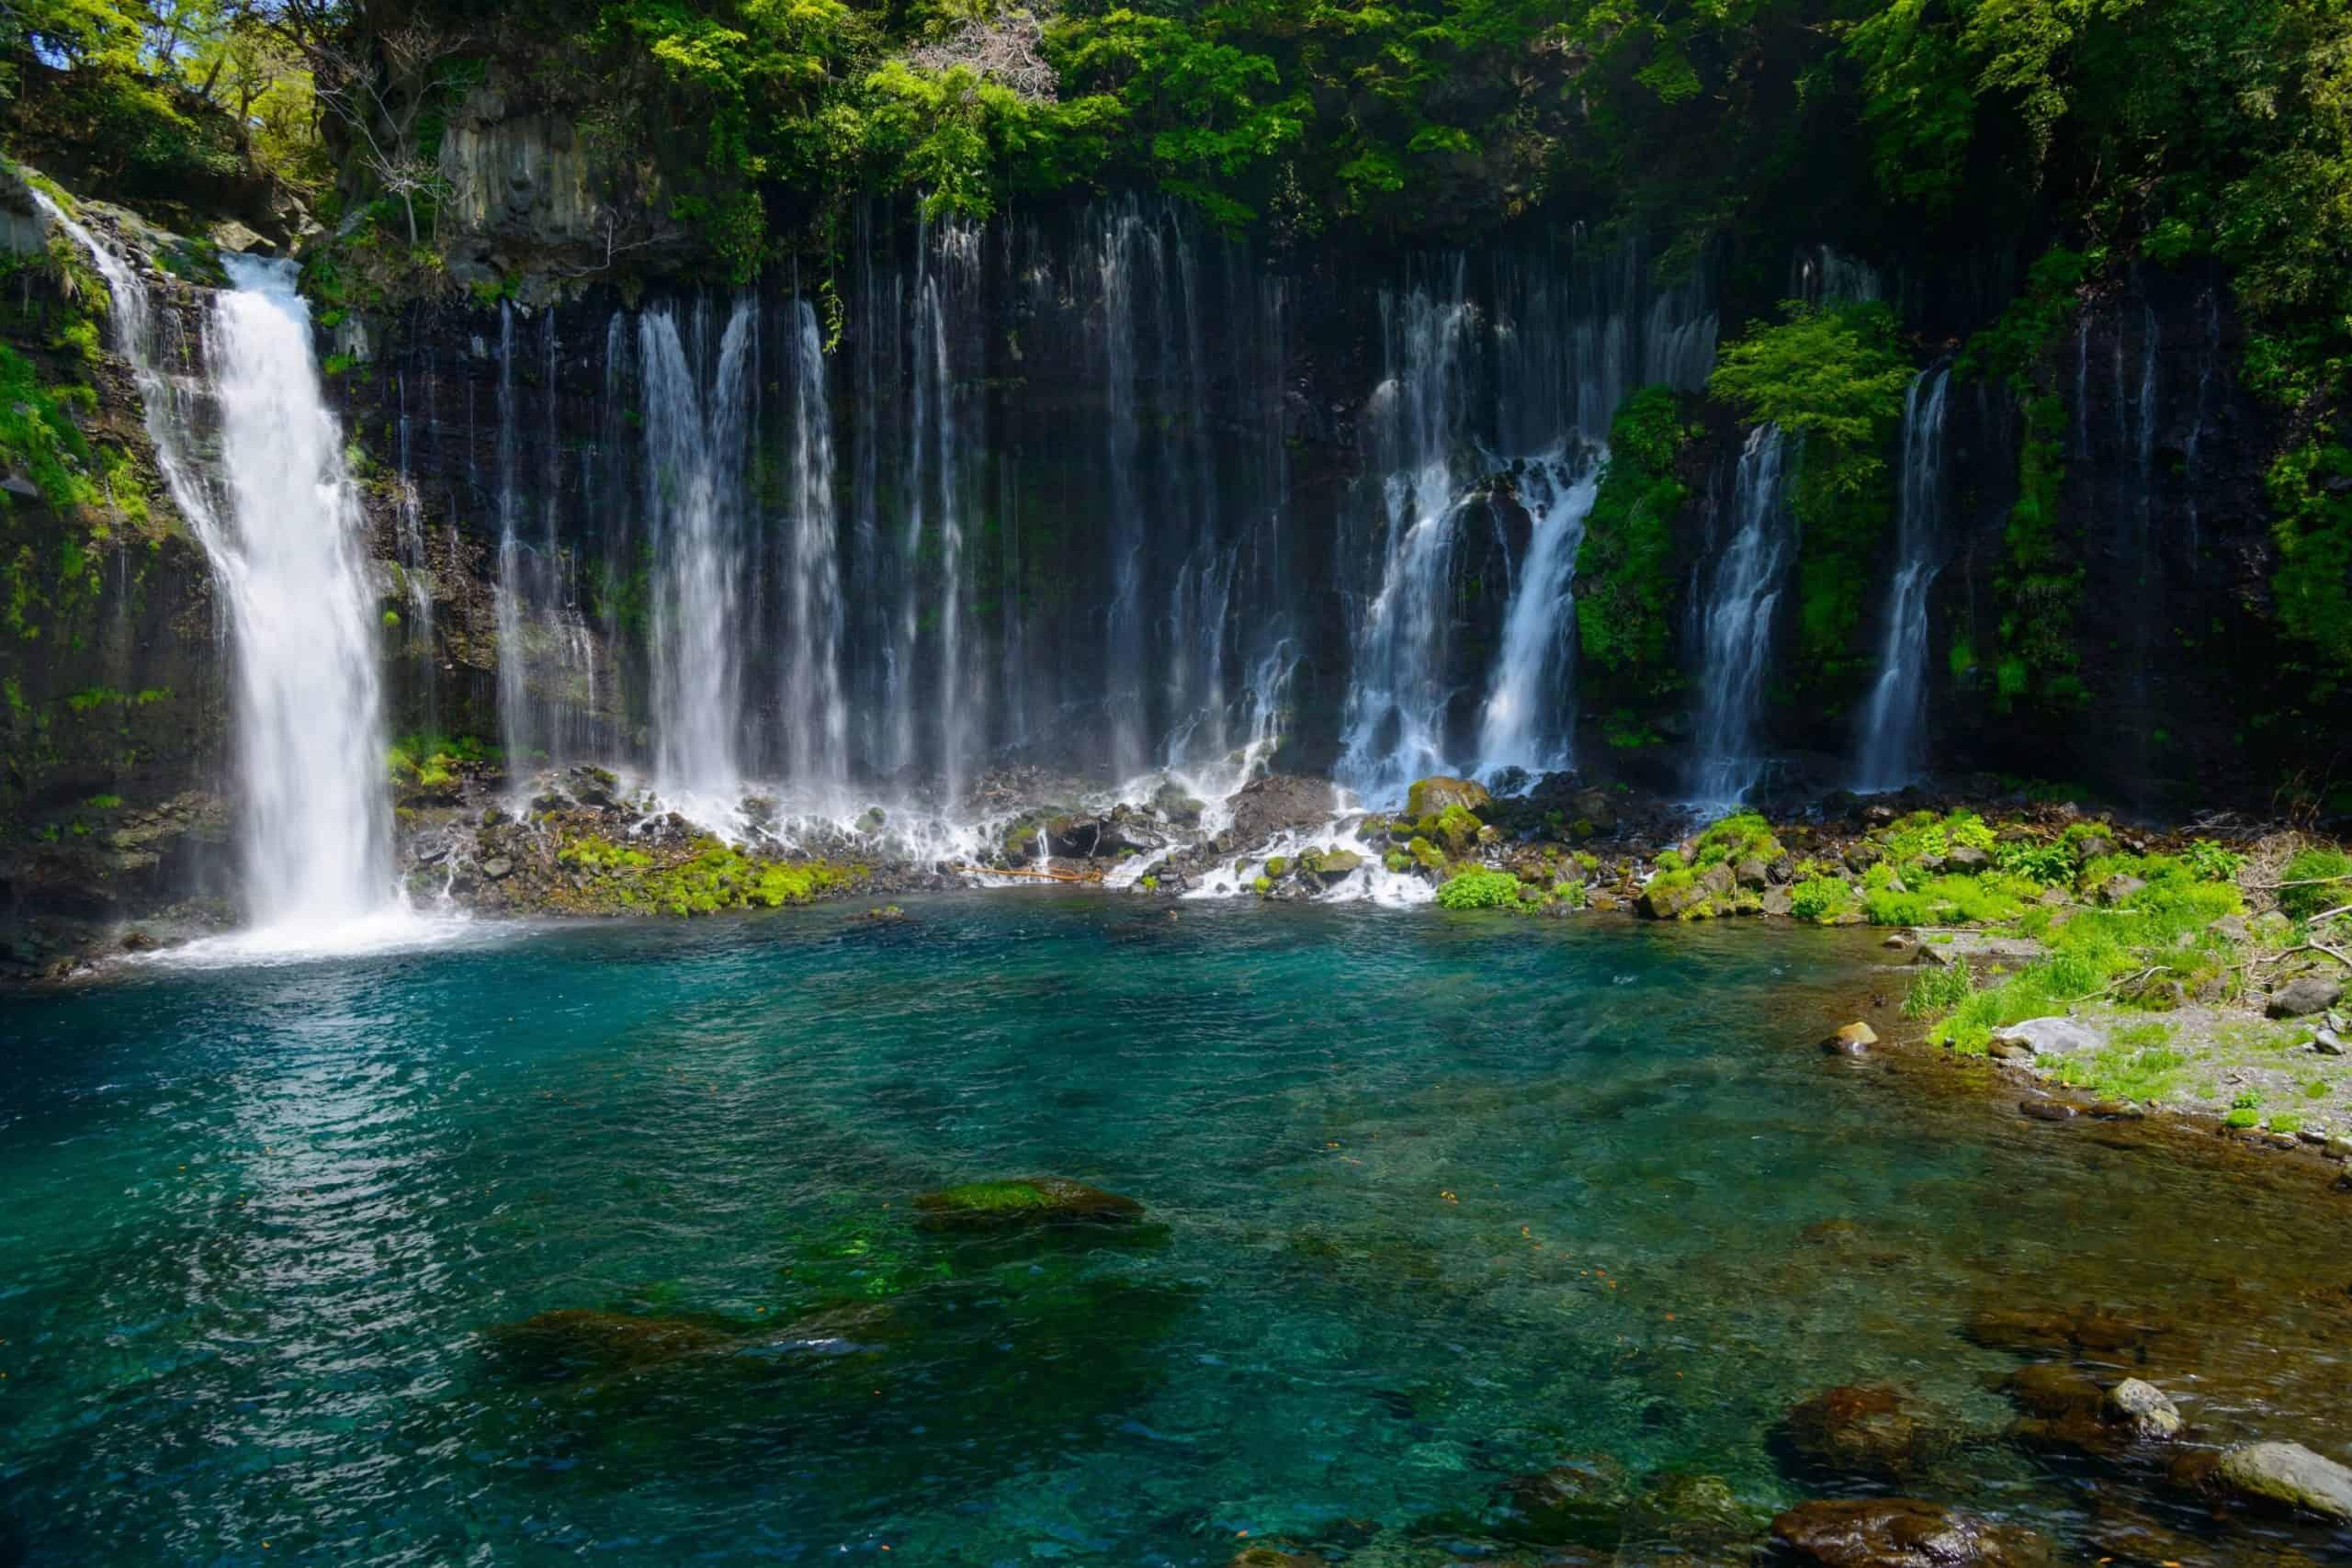 Best waterfalls in Japan - Shiraito Falls